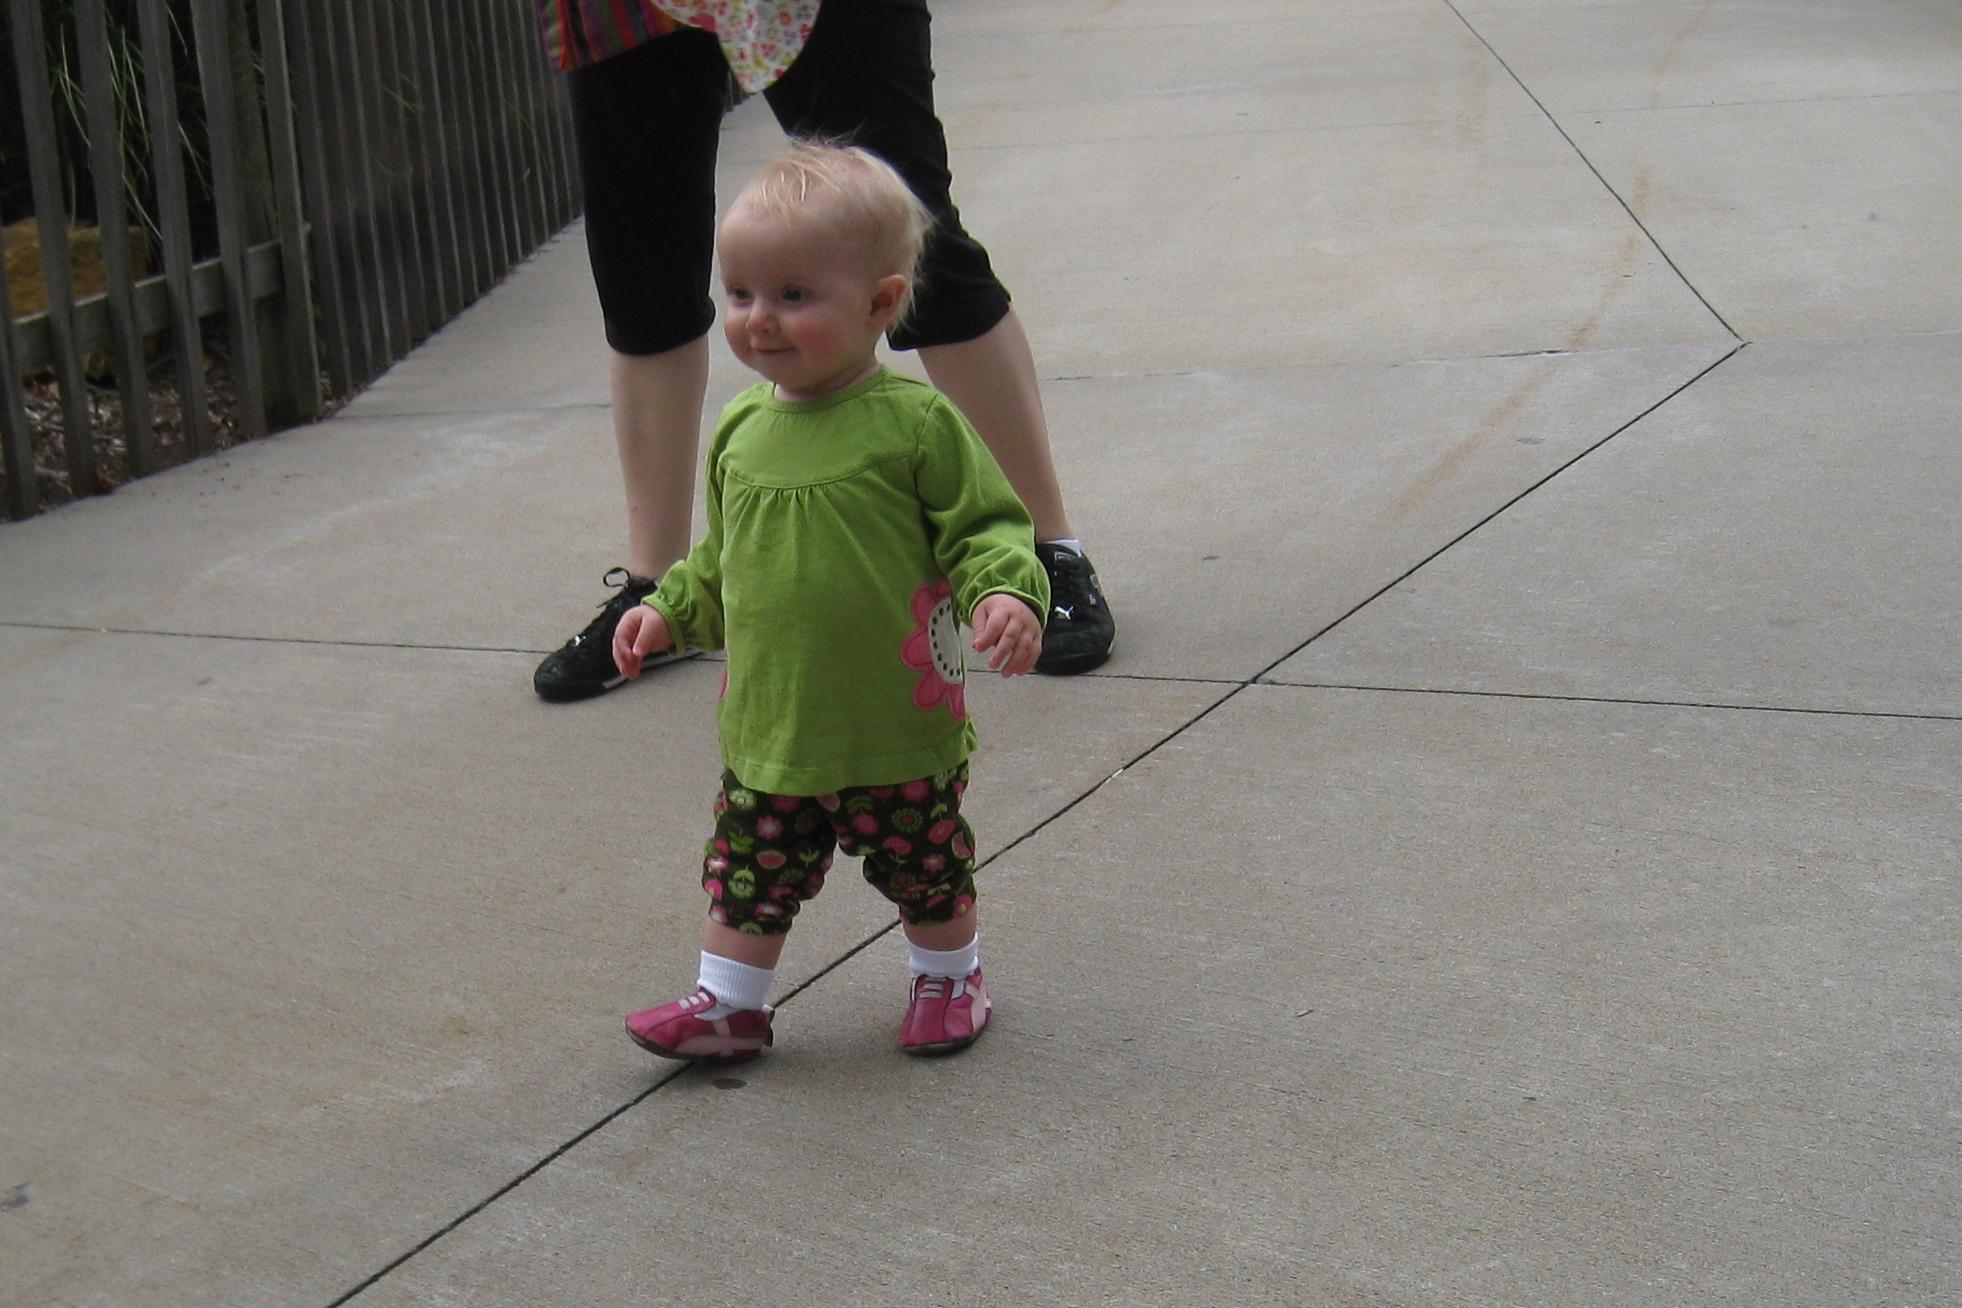 kivrin walking three